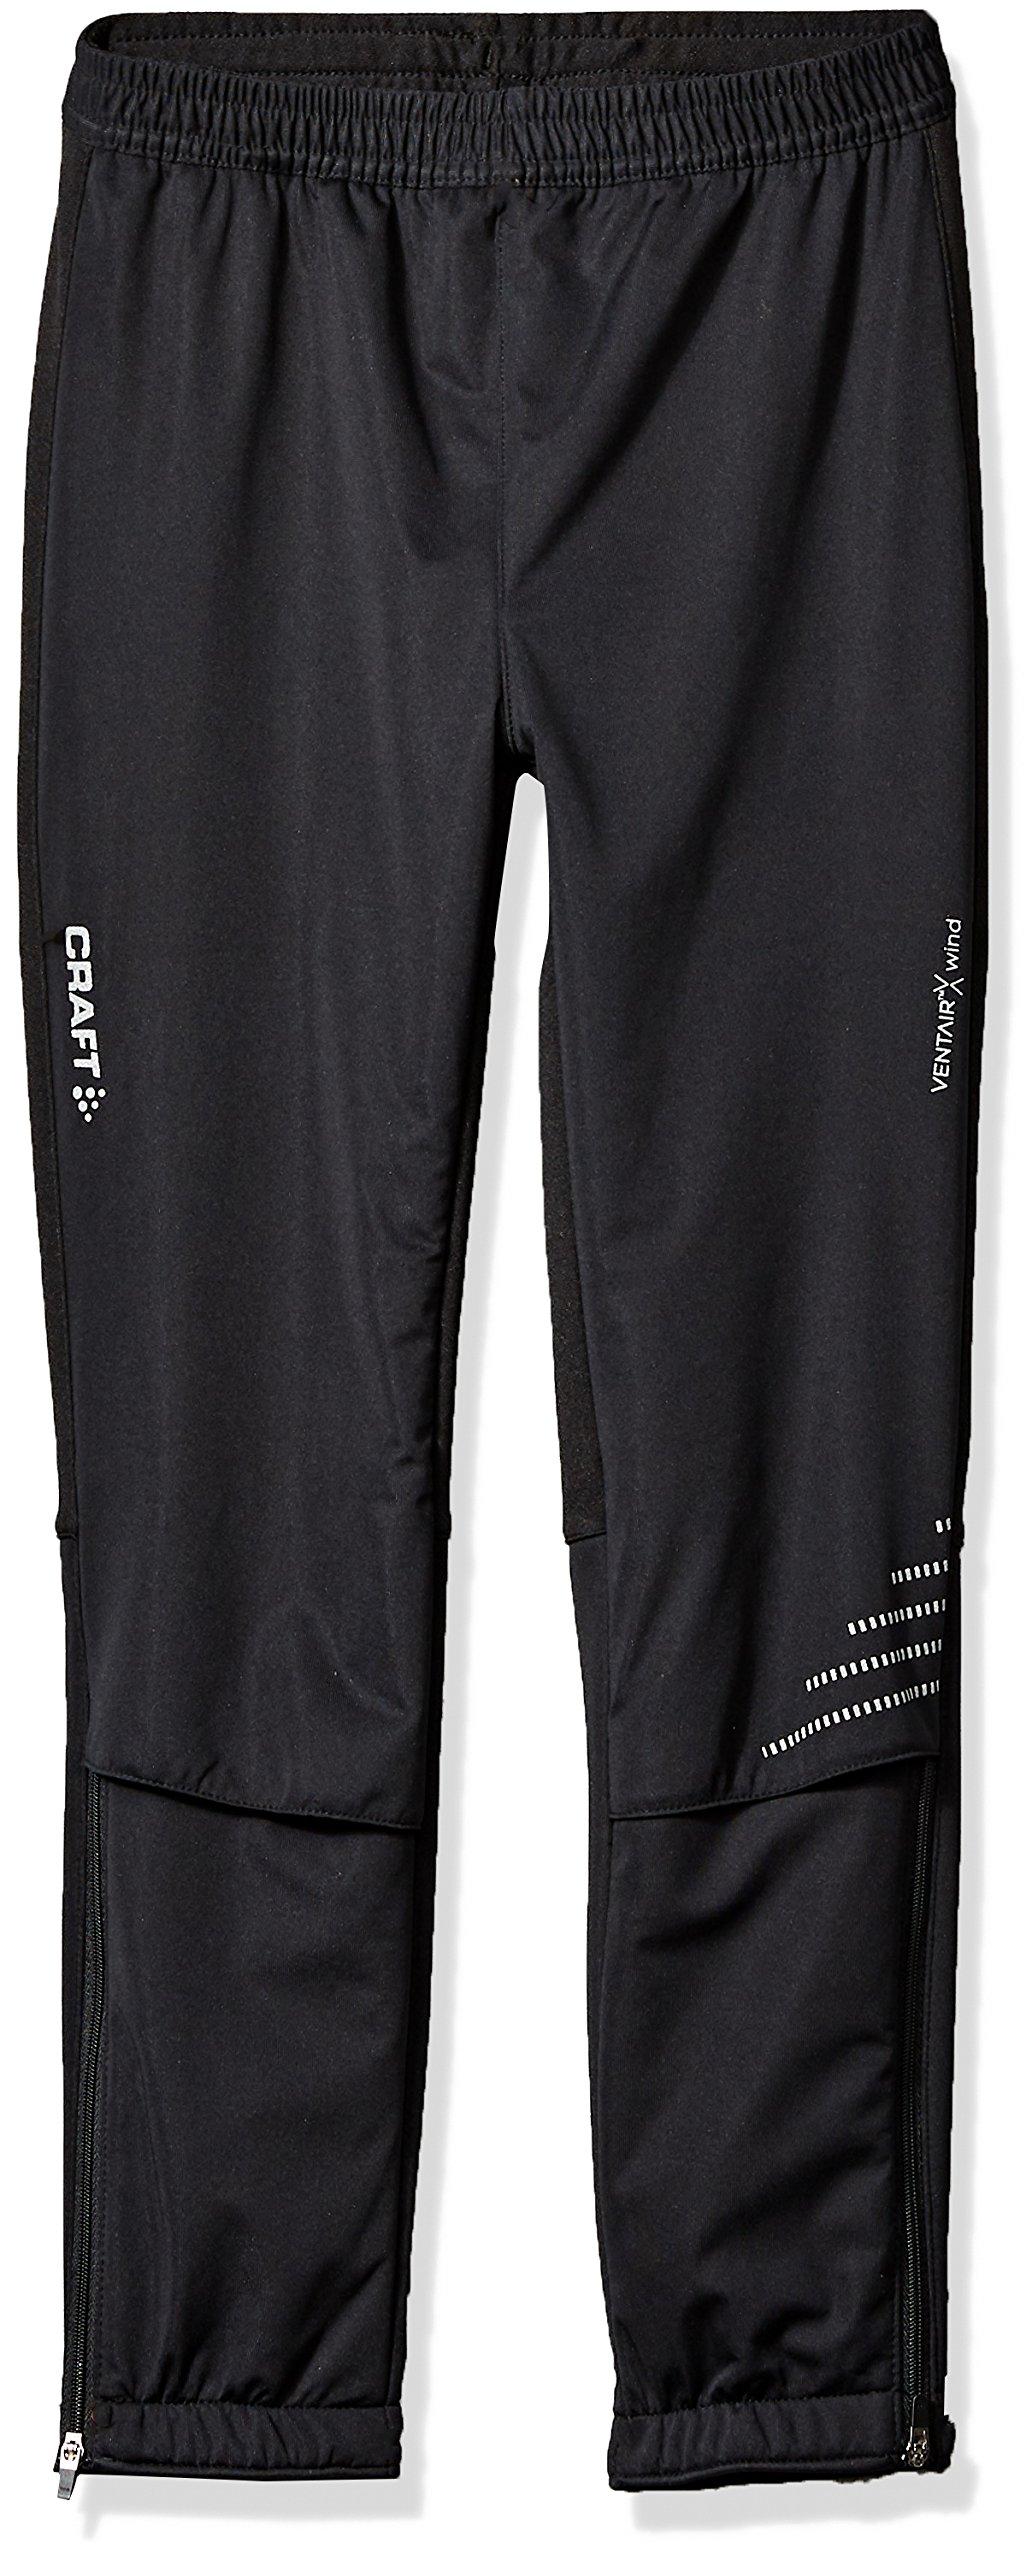 Craft Juniors Warm Pants, Black, Medium